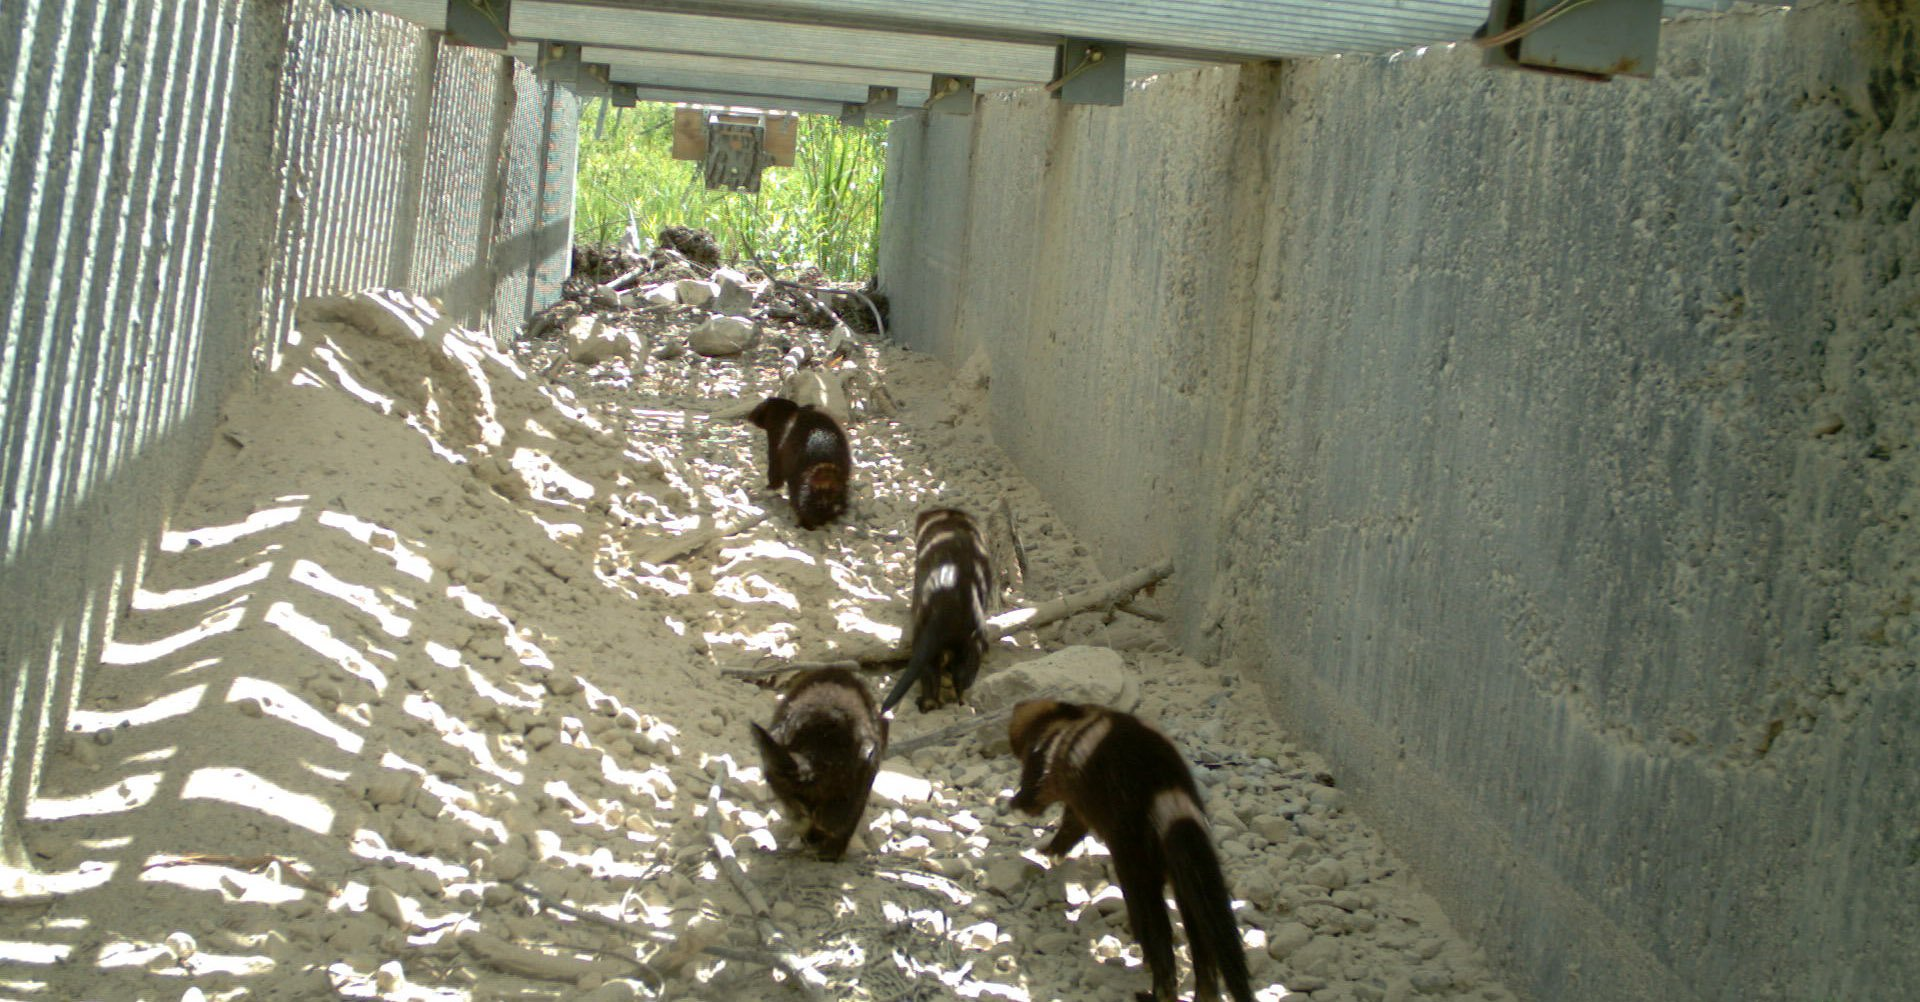 Bruce Peninsula National Park2 -Family Of Minks